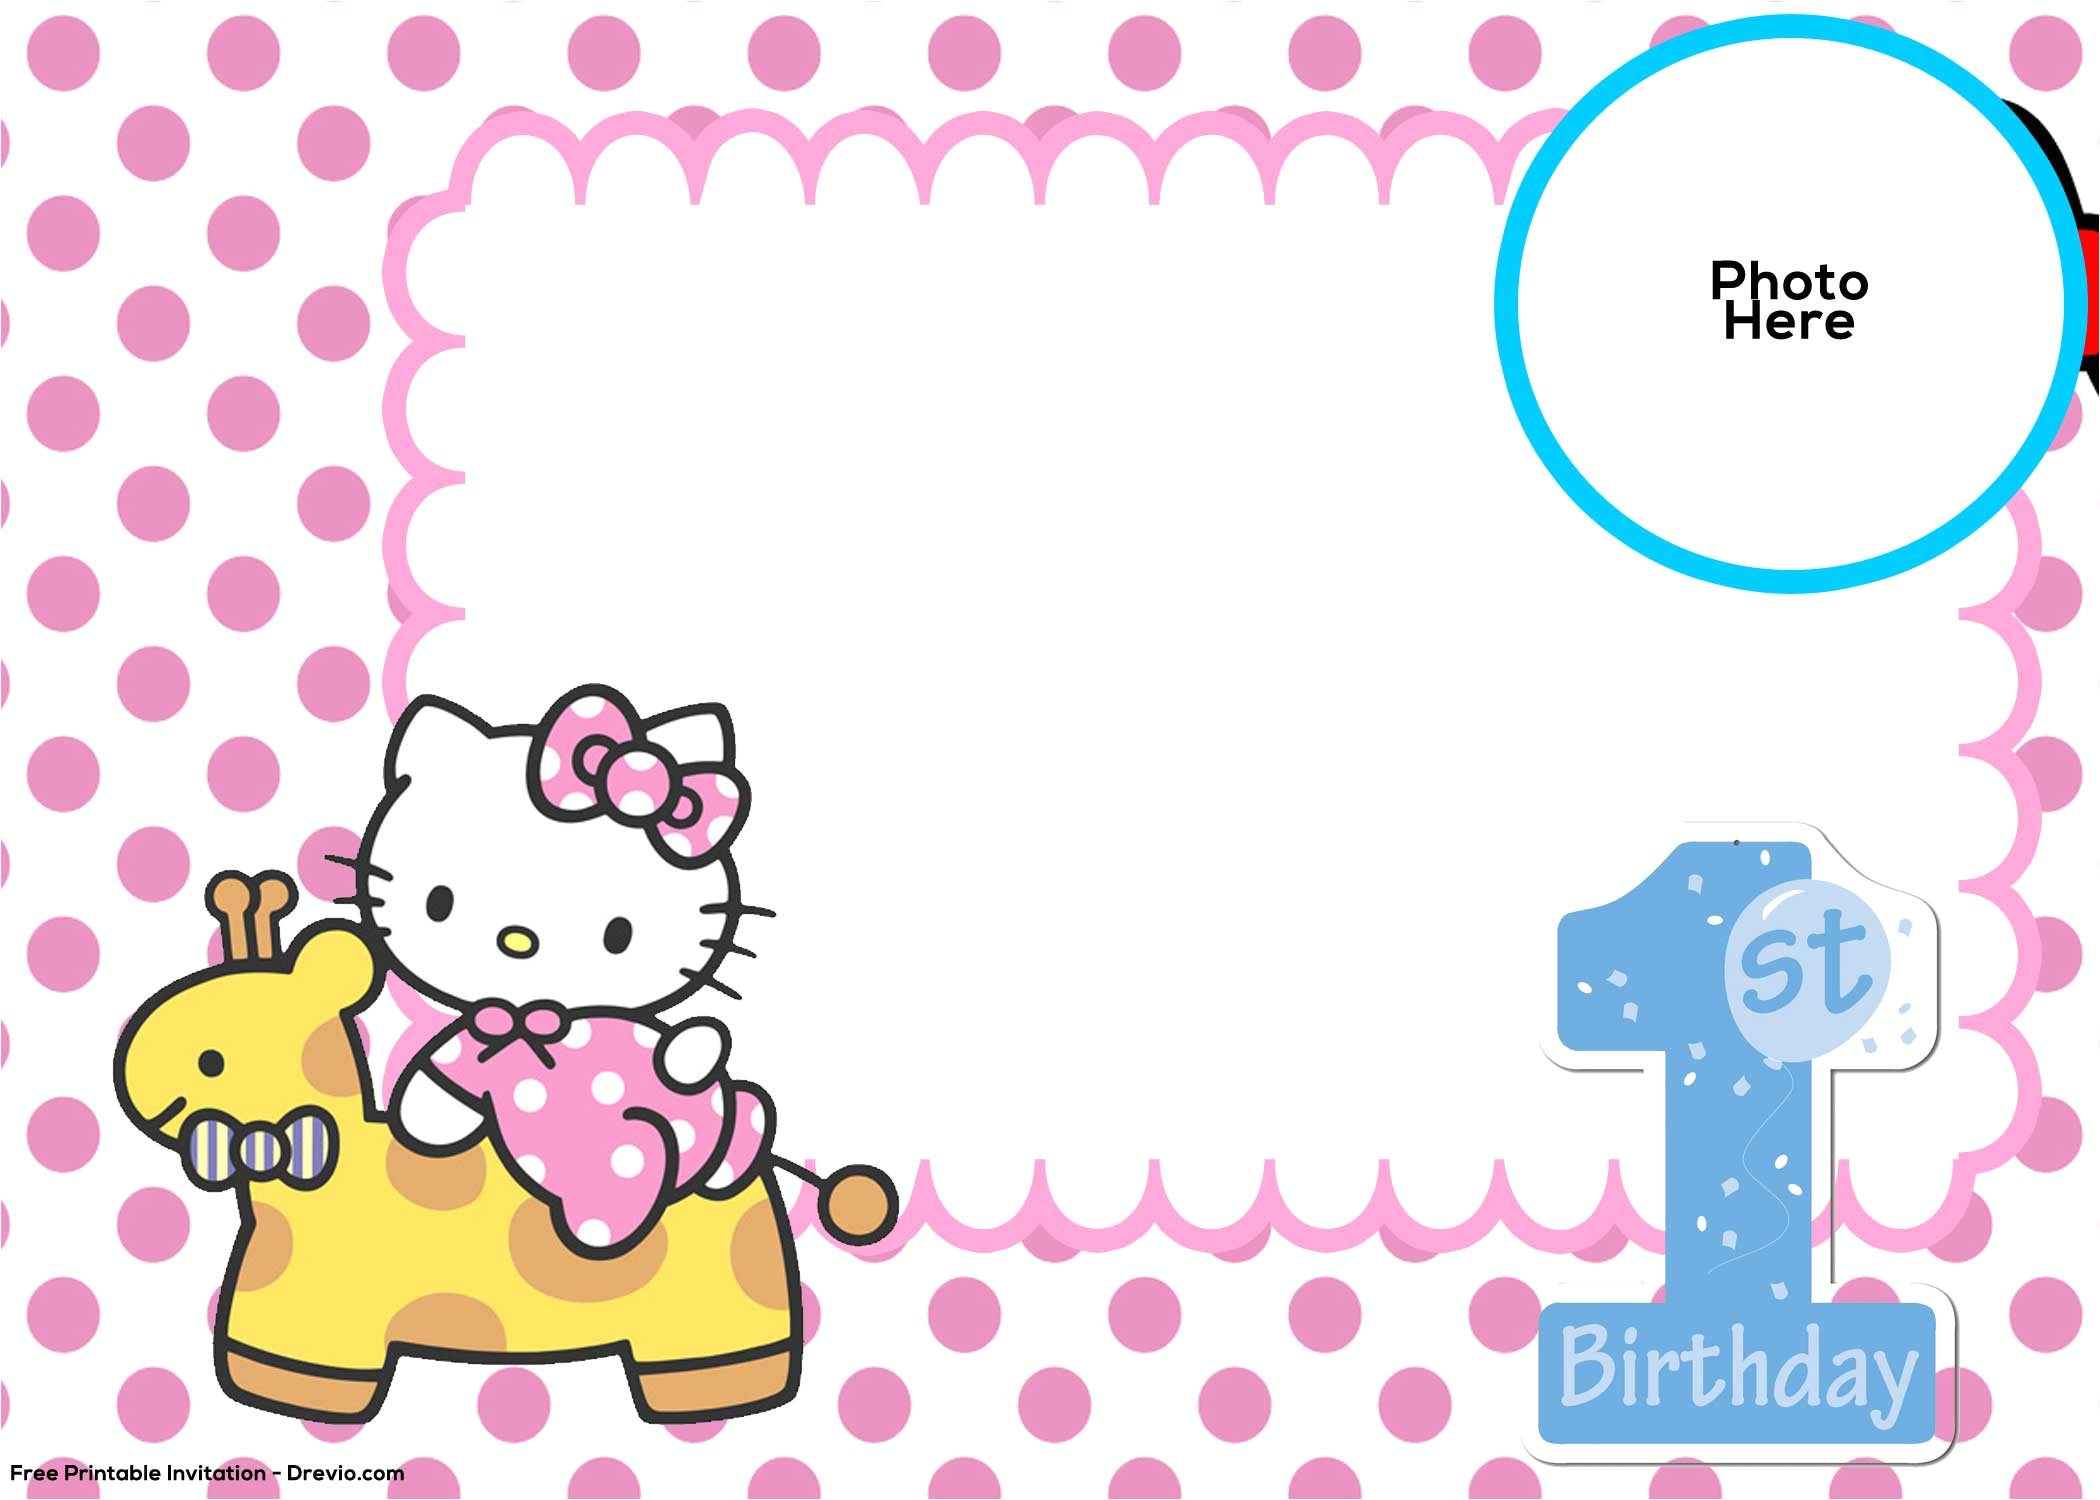 Birthday Invitation Template Hello Kitty Free Hello Kitty 1st Birthday Invitation Template Free